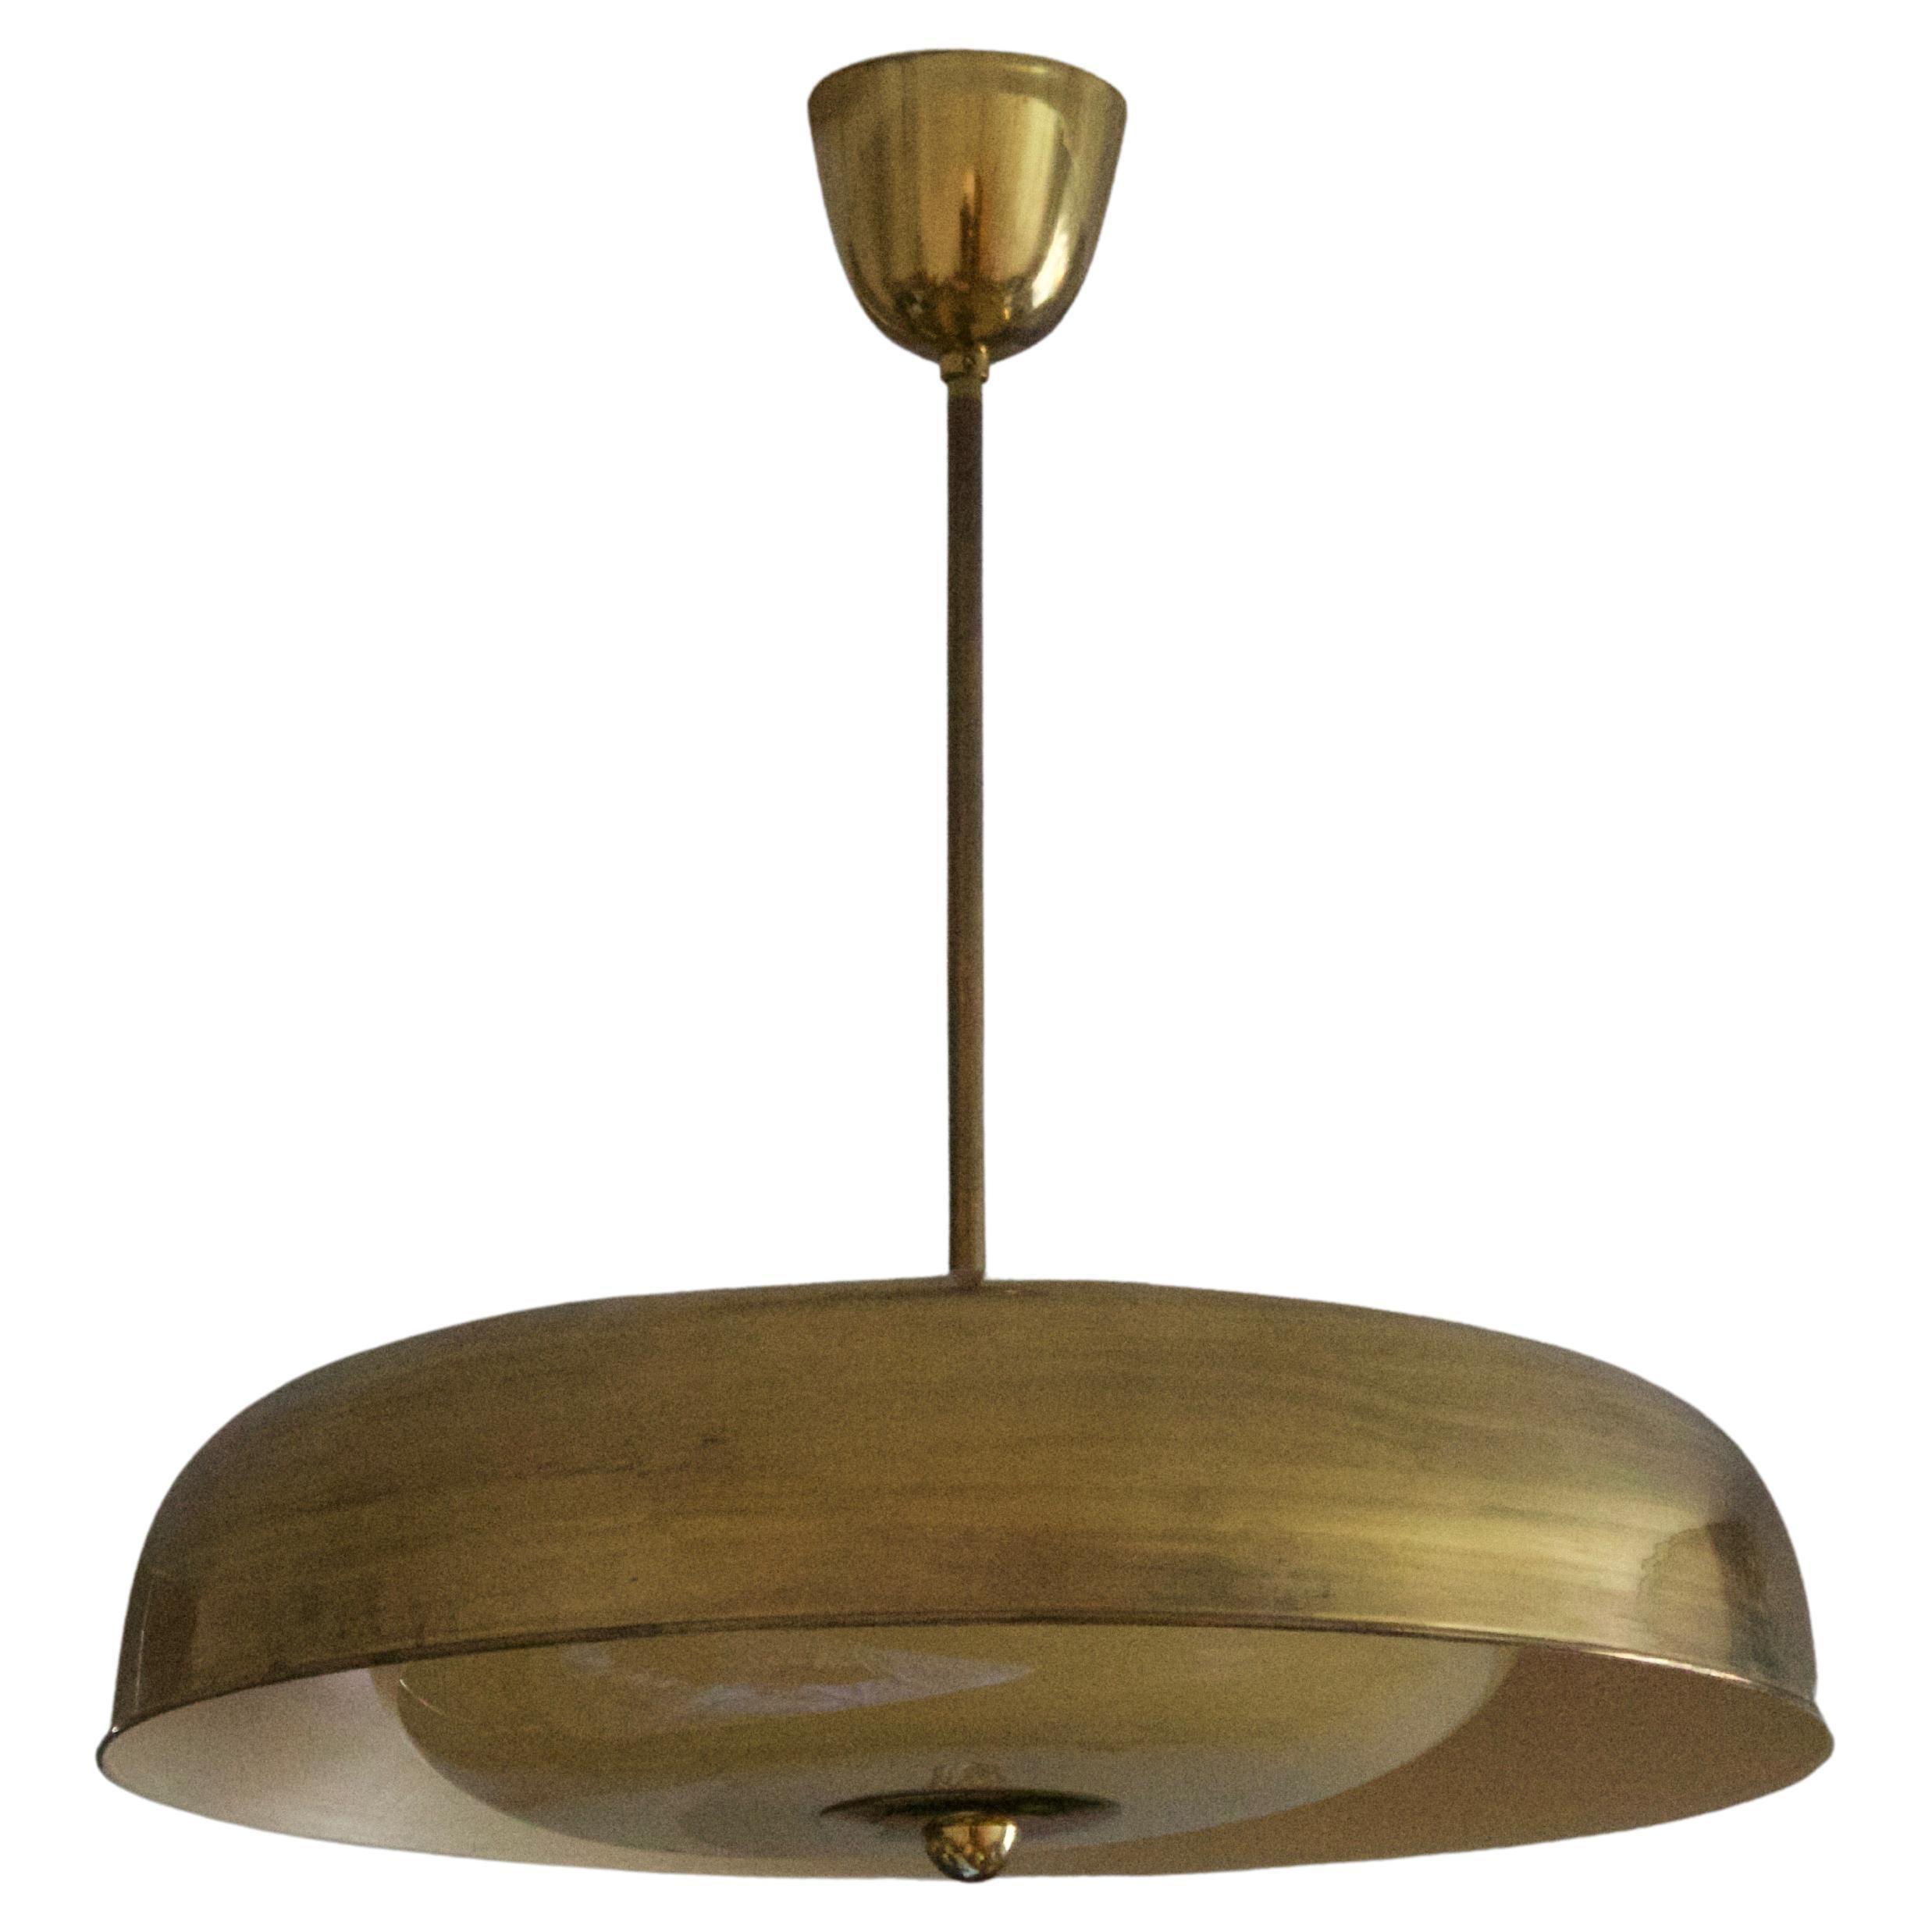 Mauri Almari, Sizable Pendant Light, Brass, Glass, Idman, Finland, 1950s